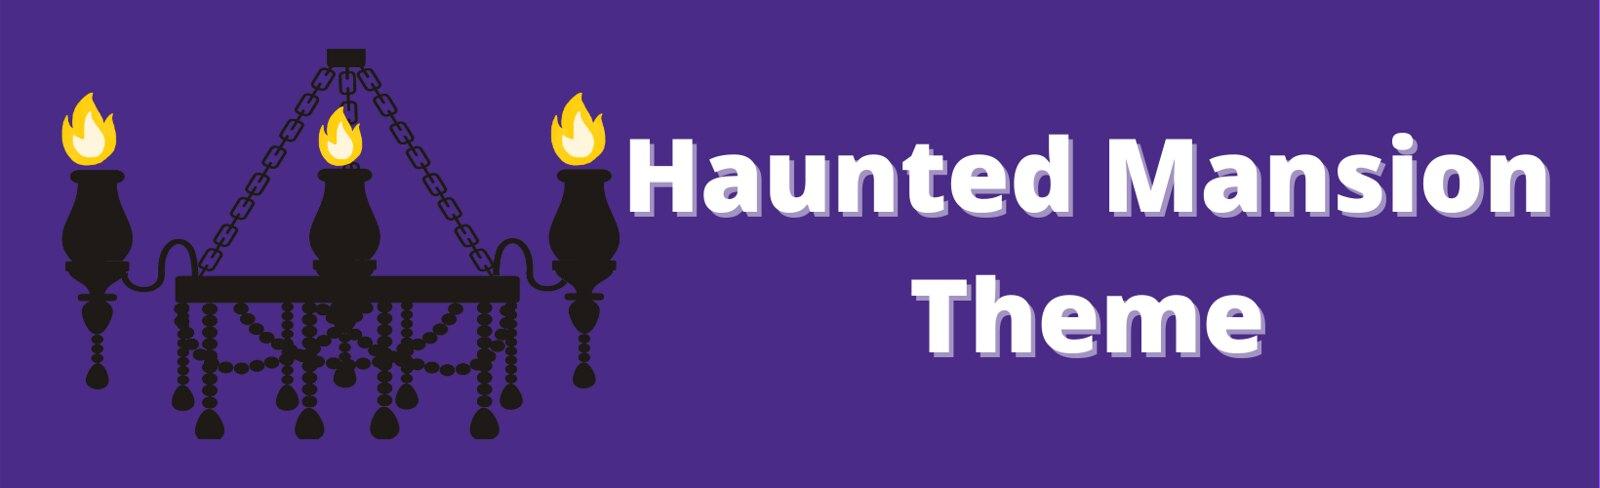 Haunted Mansion Theme